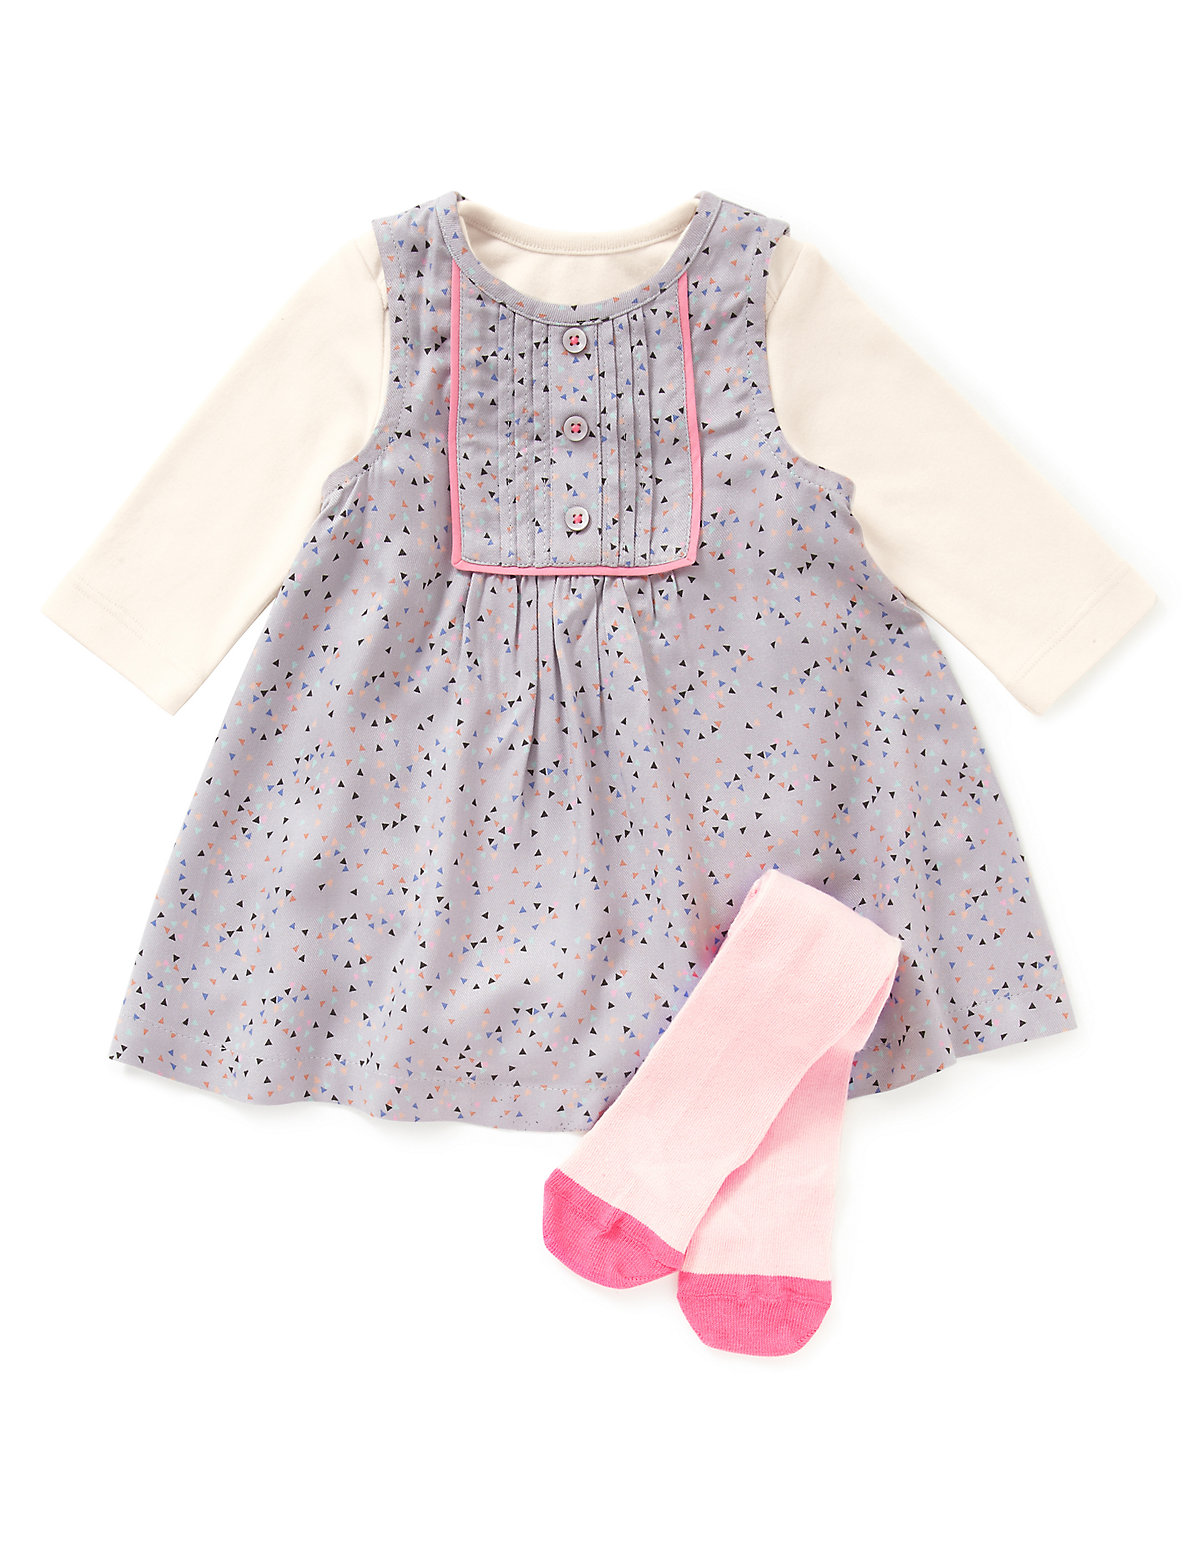 3 Piece Cotton Rich Corduroy Pinafore Dress, Bodysuit & Tights Outfit